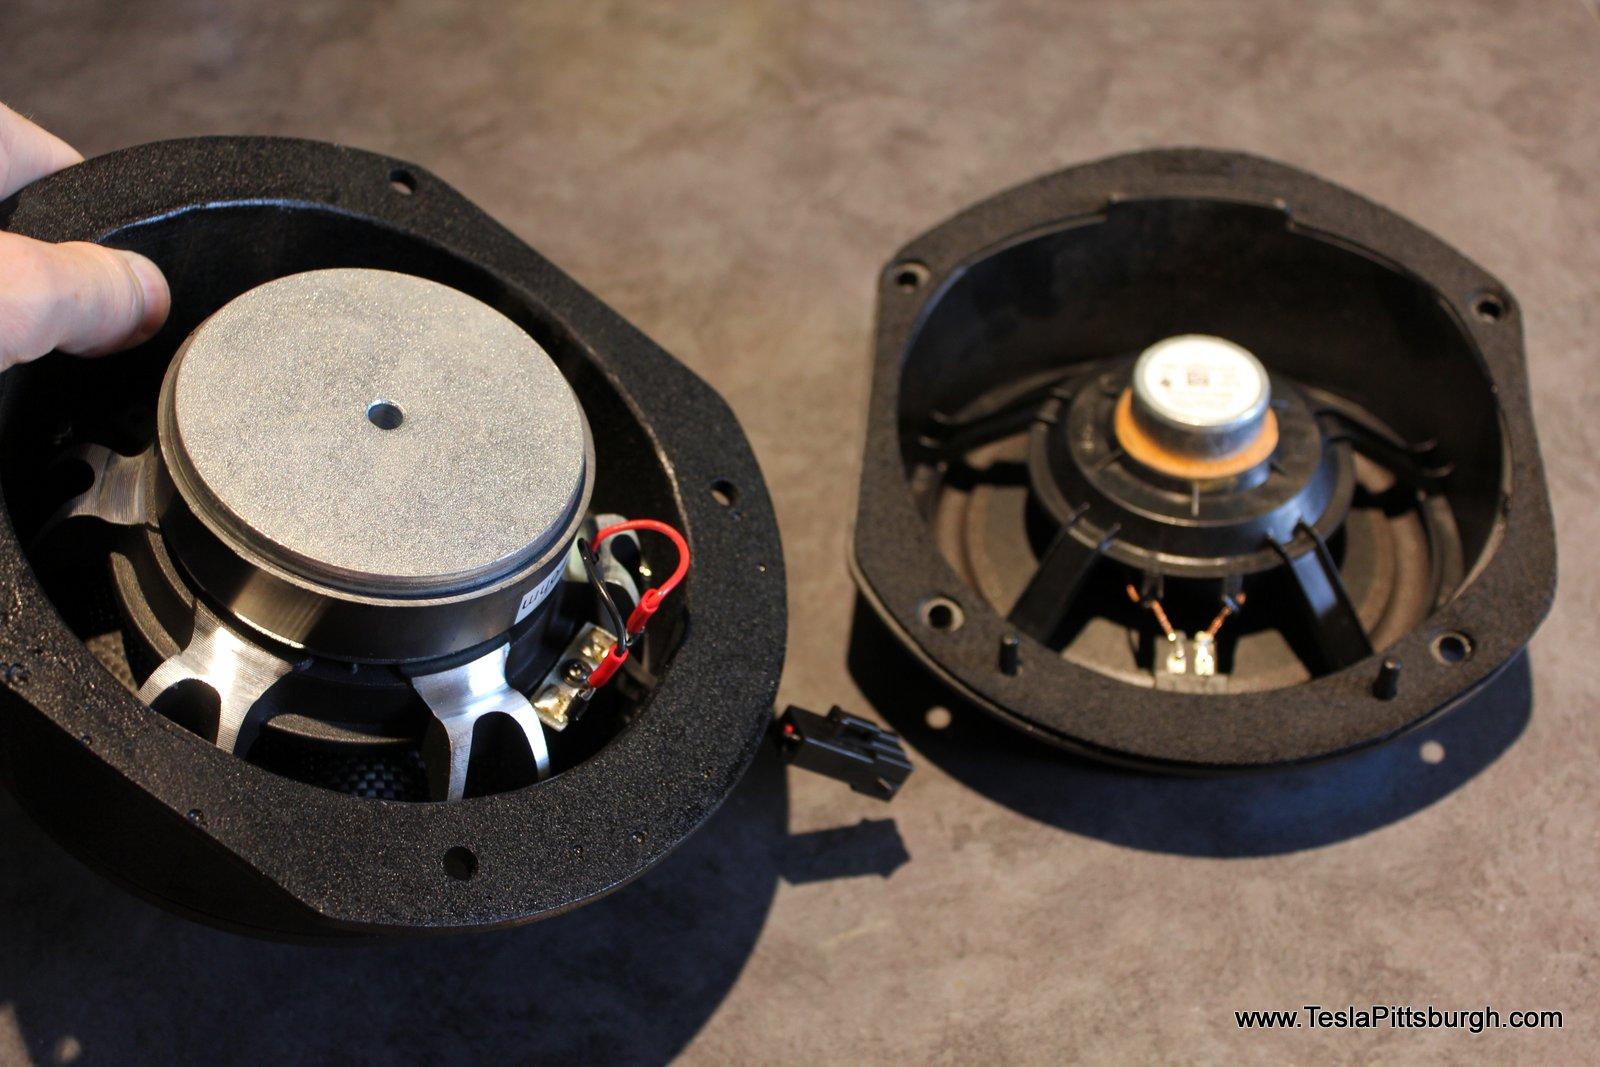 light harmonic labs speaker magnet stock comparison tesla pittsburgh